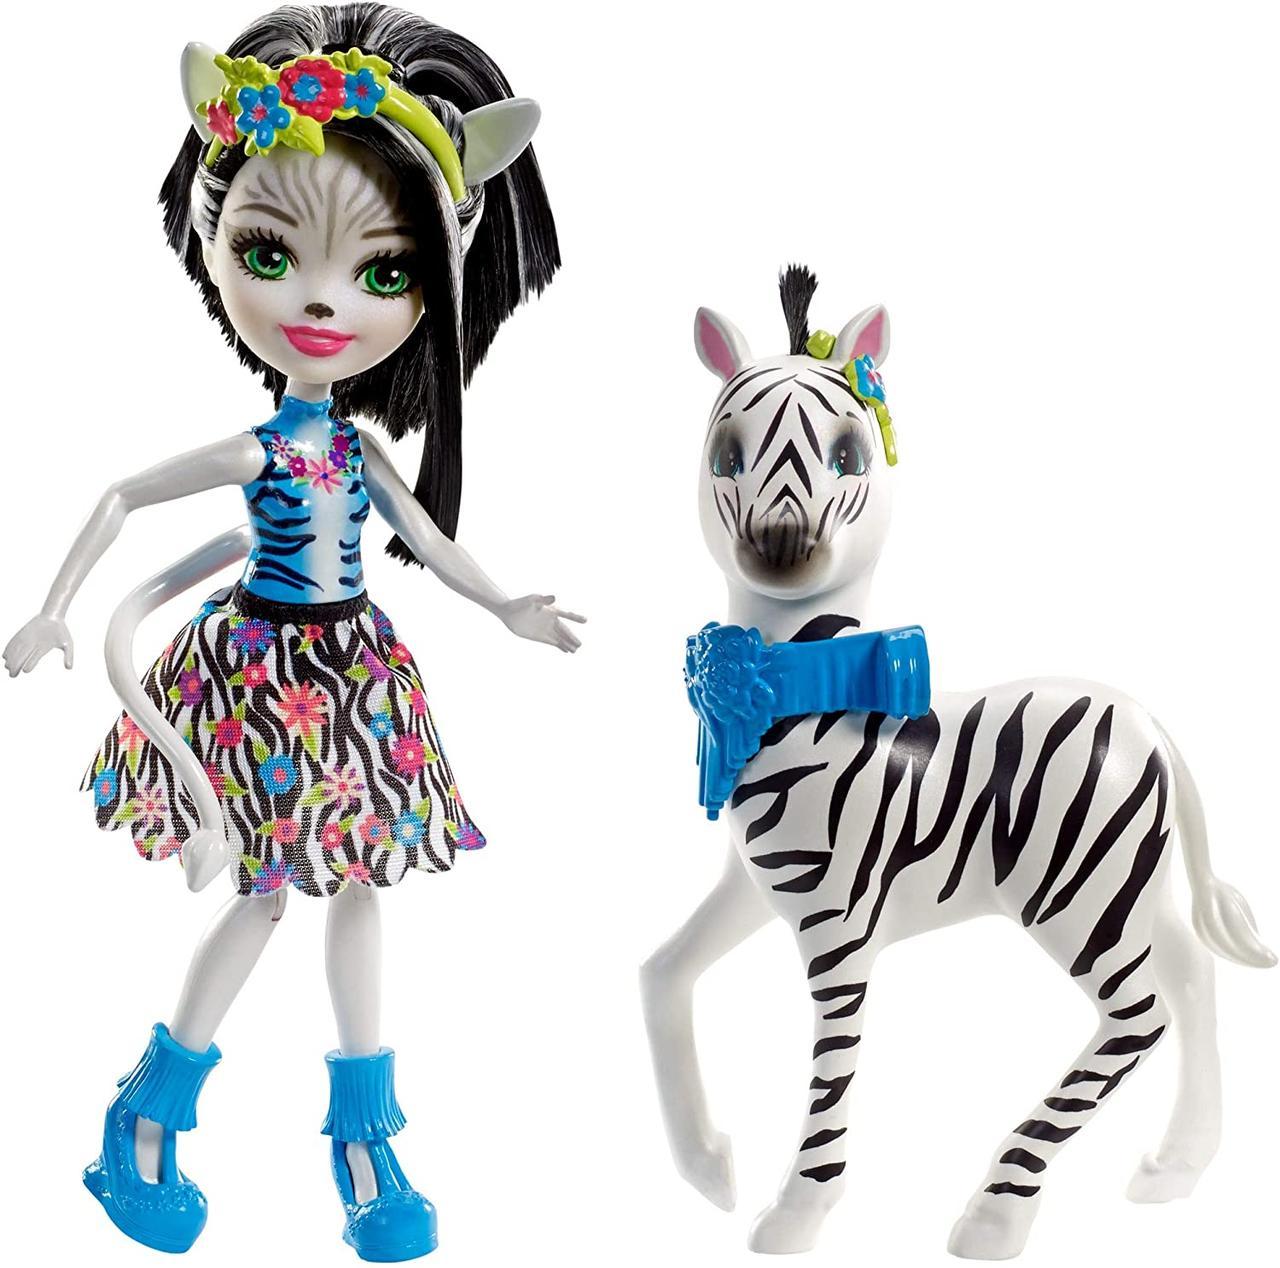 Лялька Зелена Зебра Enchantimals Zelena Zebra Doll зелена зибра Энчантималс оригінал